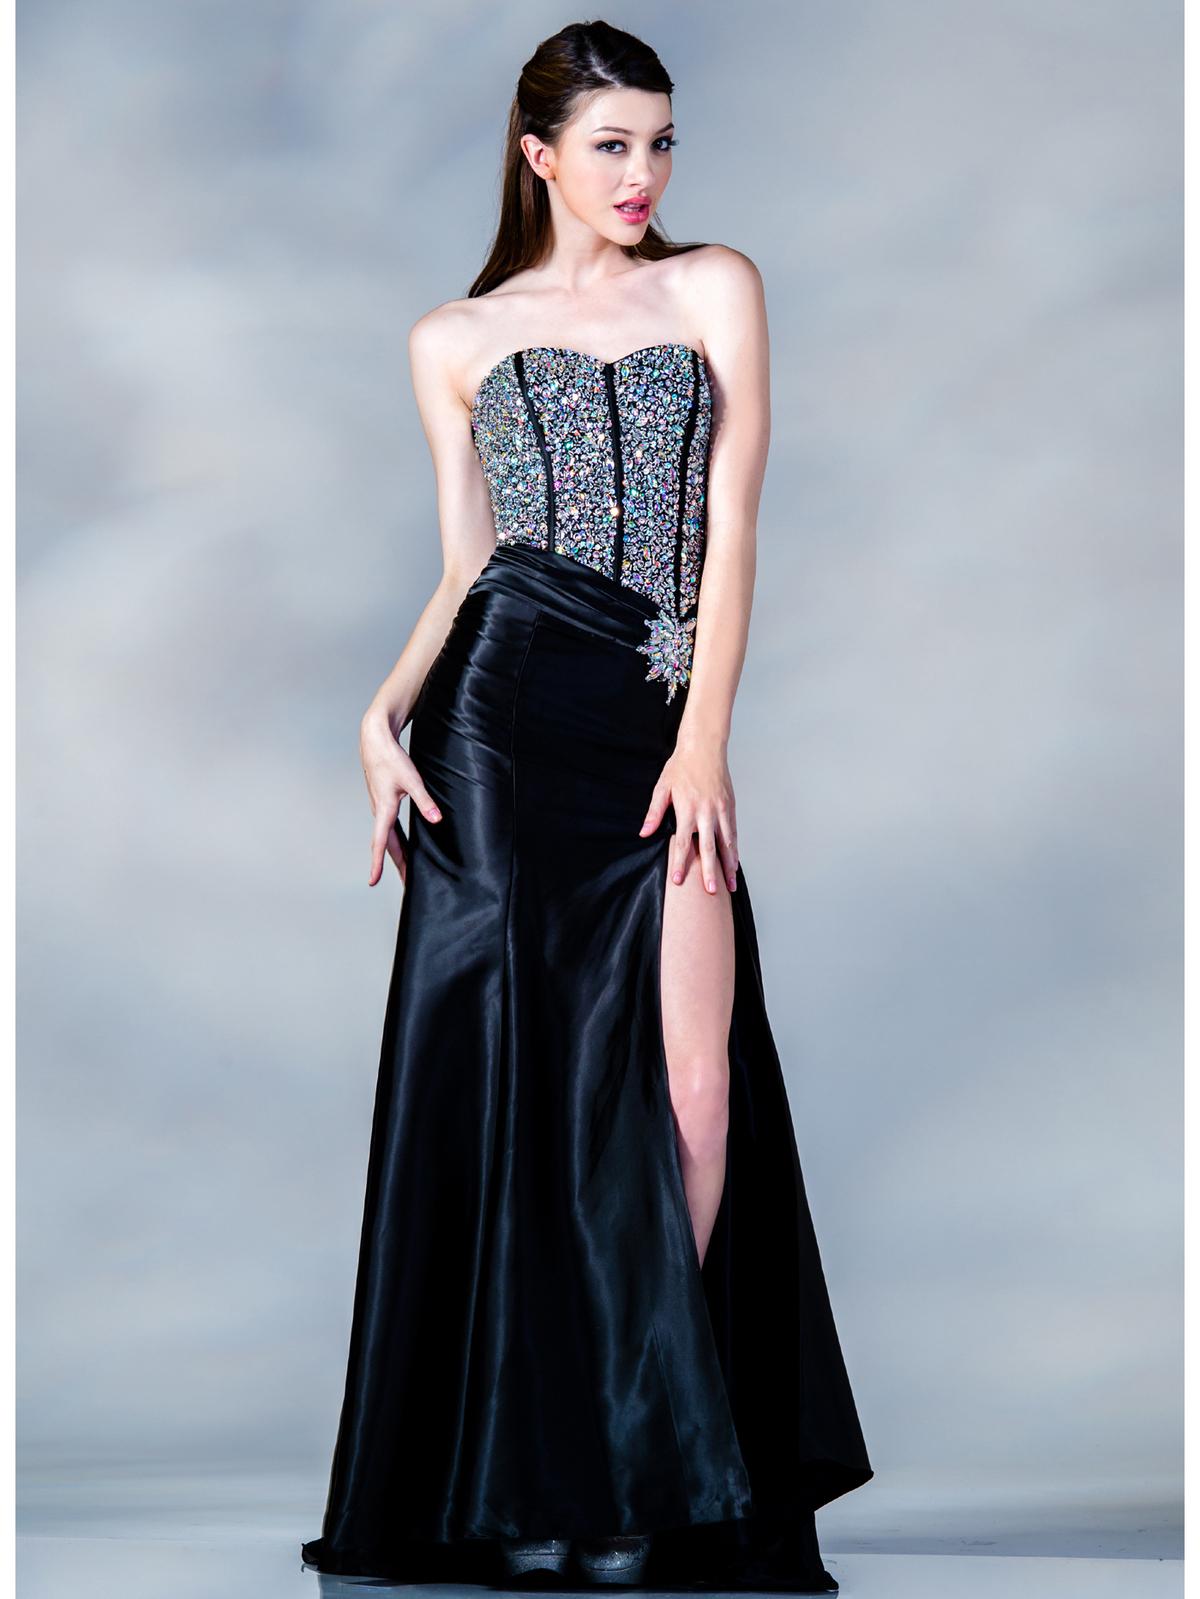 Black dress for prom night - Fashion Prom Dress